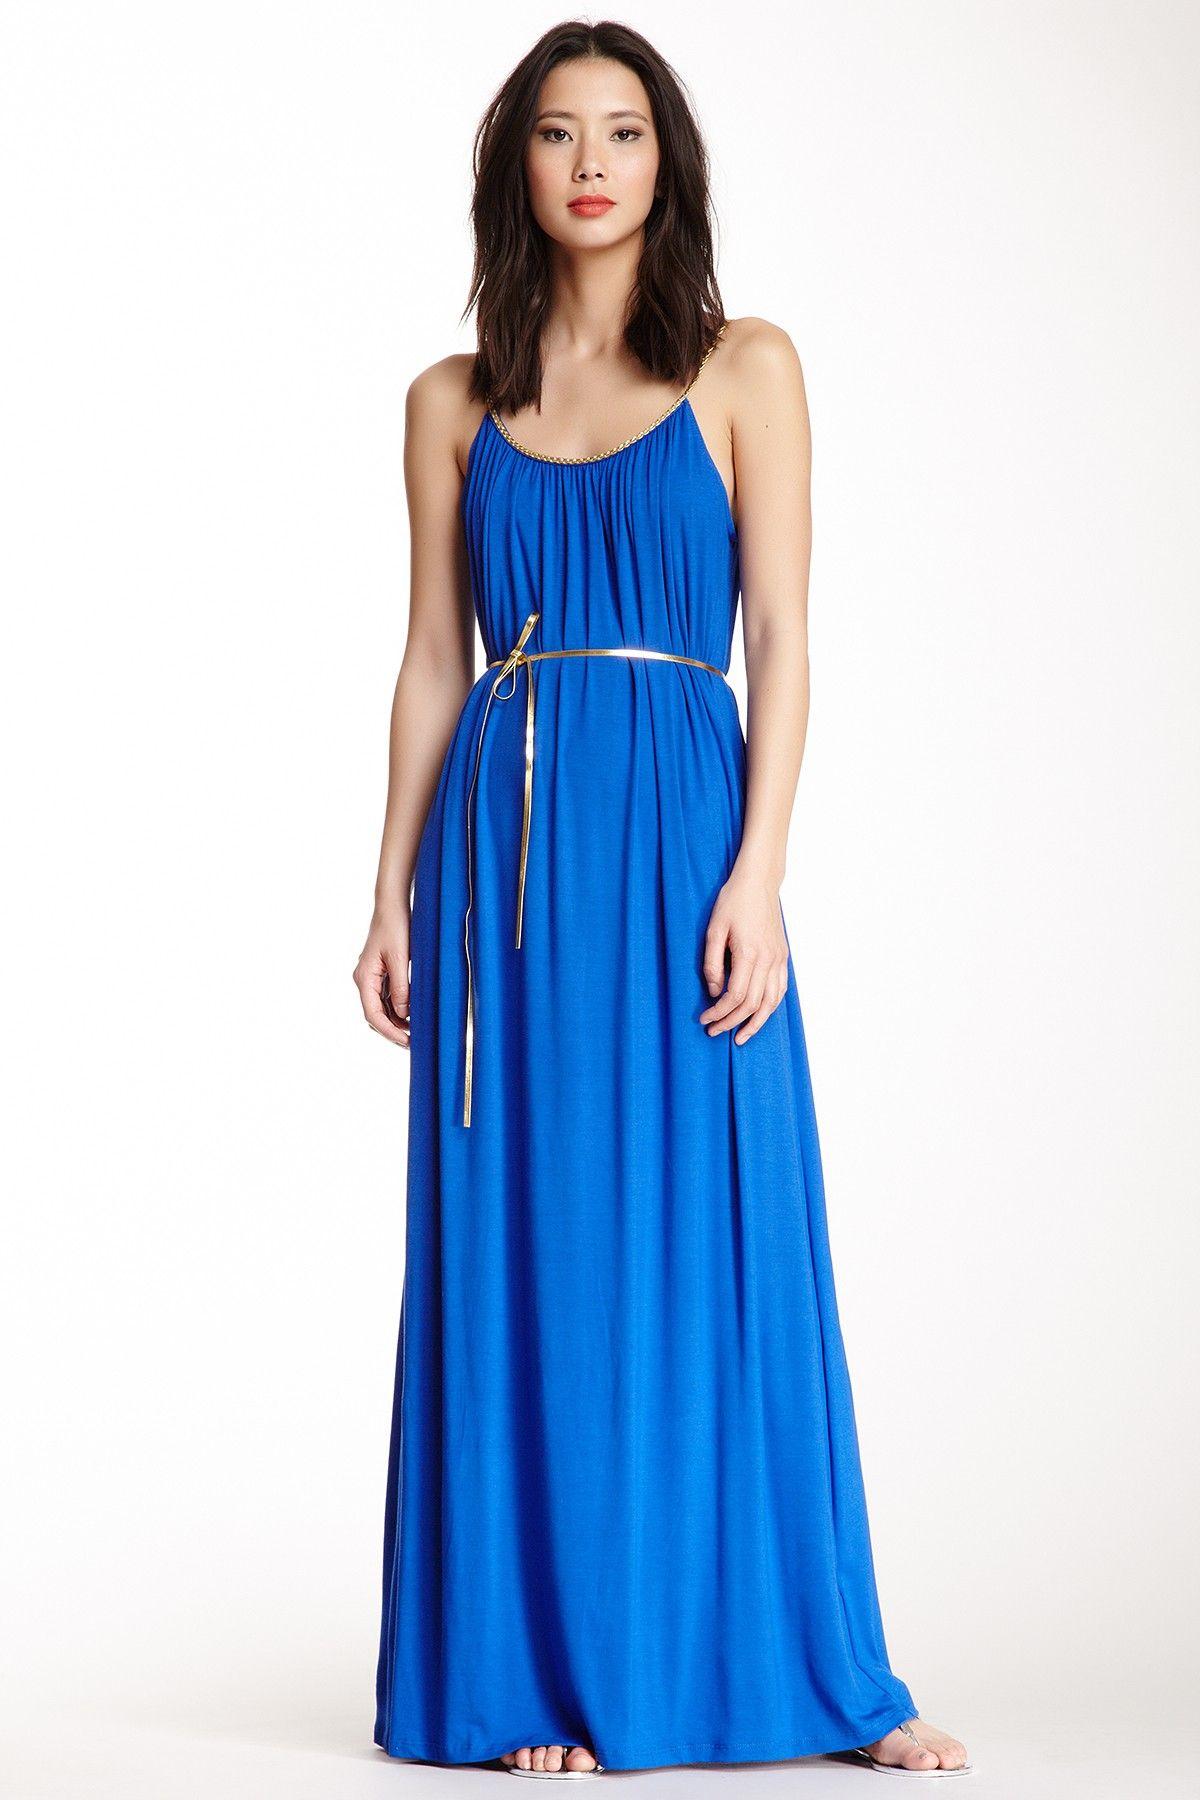 Tiana b gold trim maxi dress dresses pinterest tiana maxi